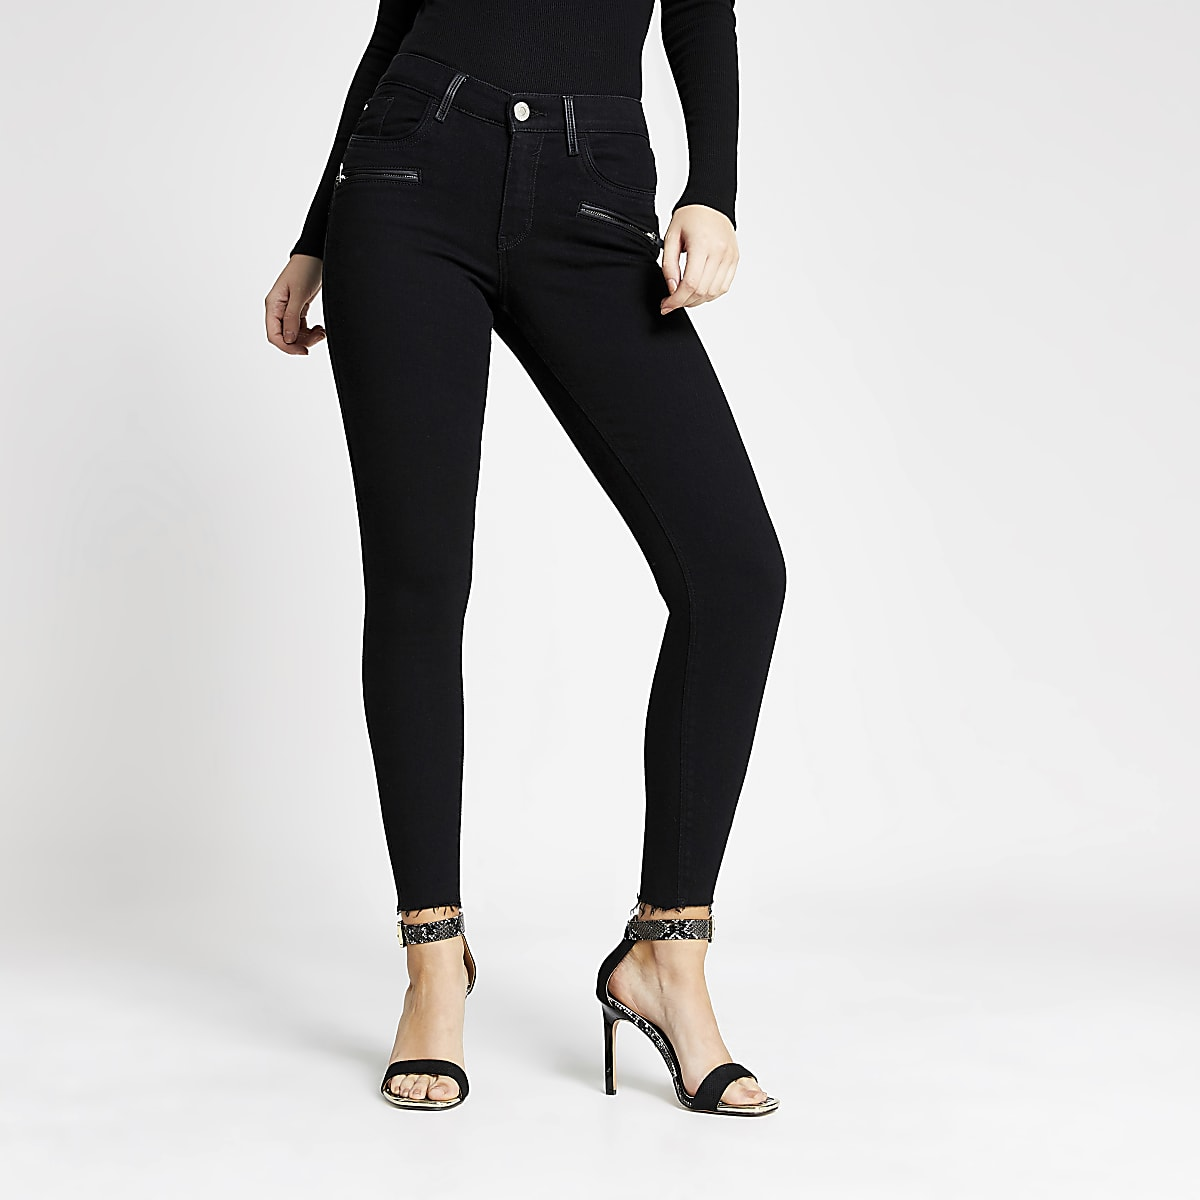 Amelie - Zwarte superskinny jeans met broekzak met ritssluiting